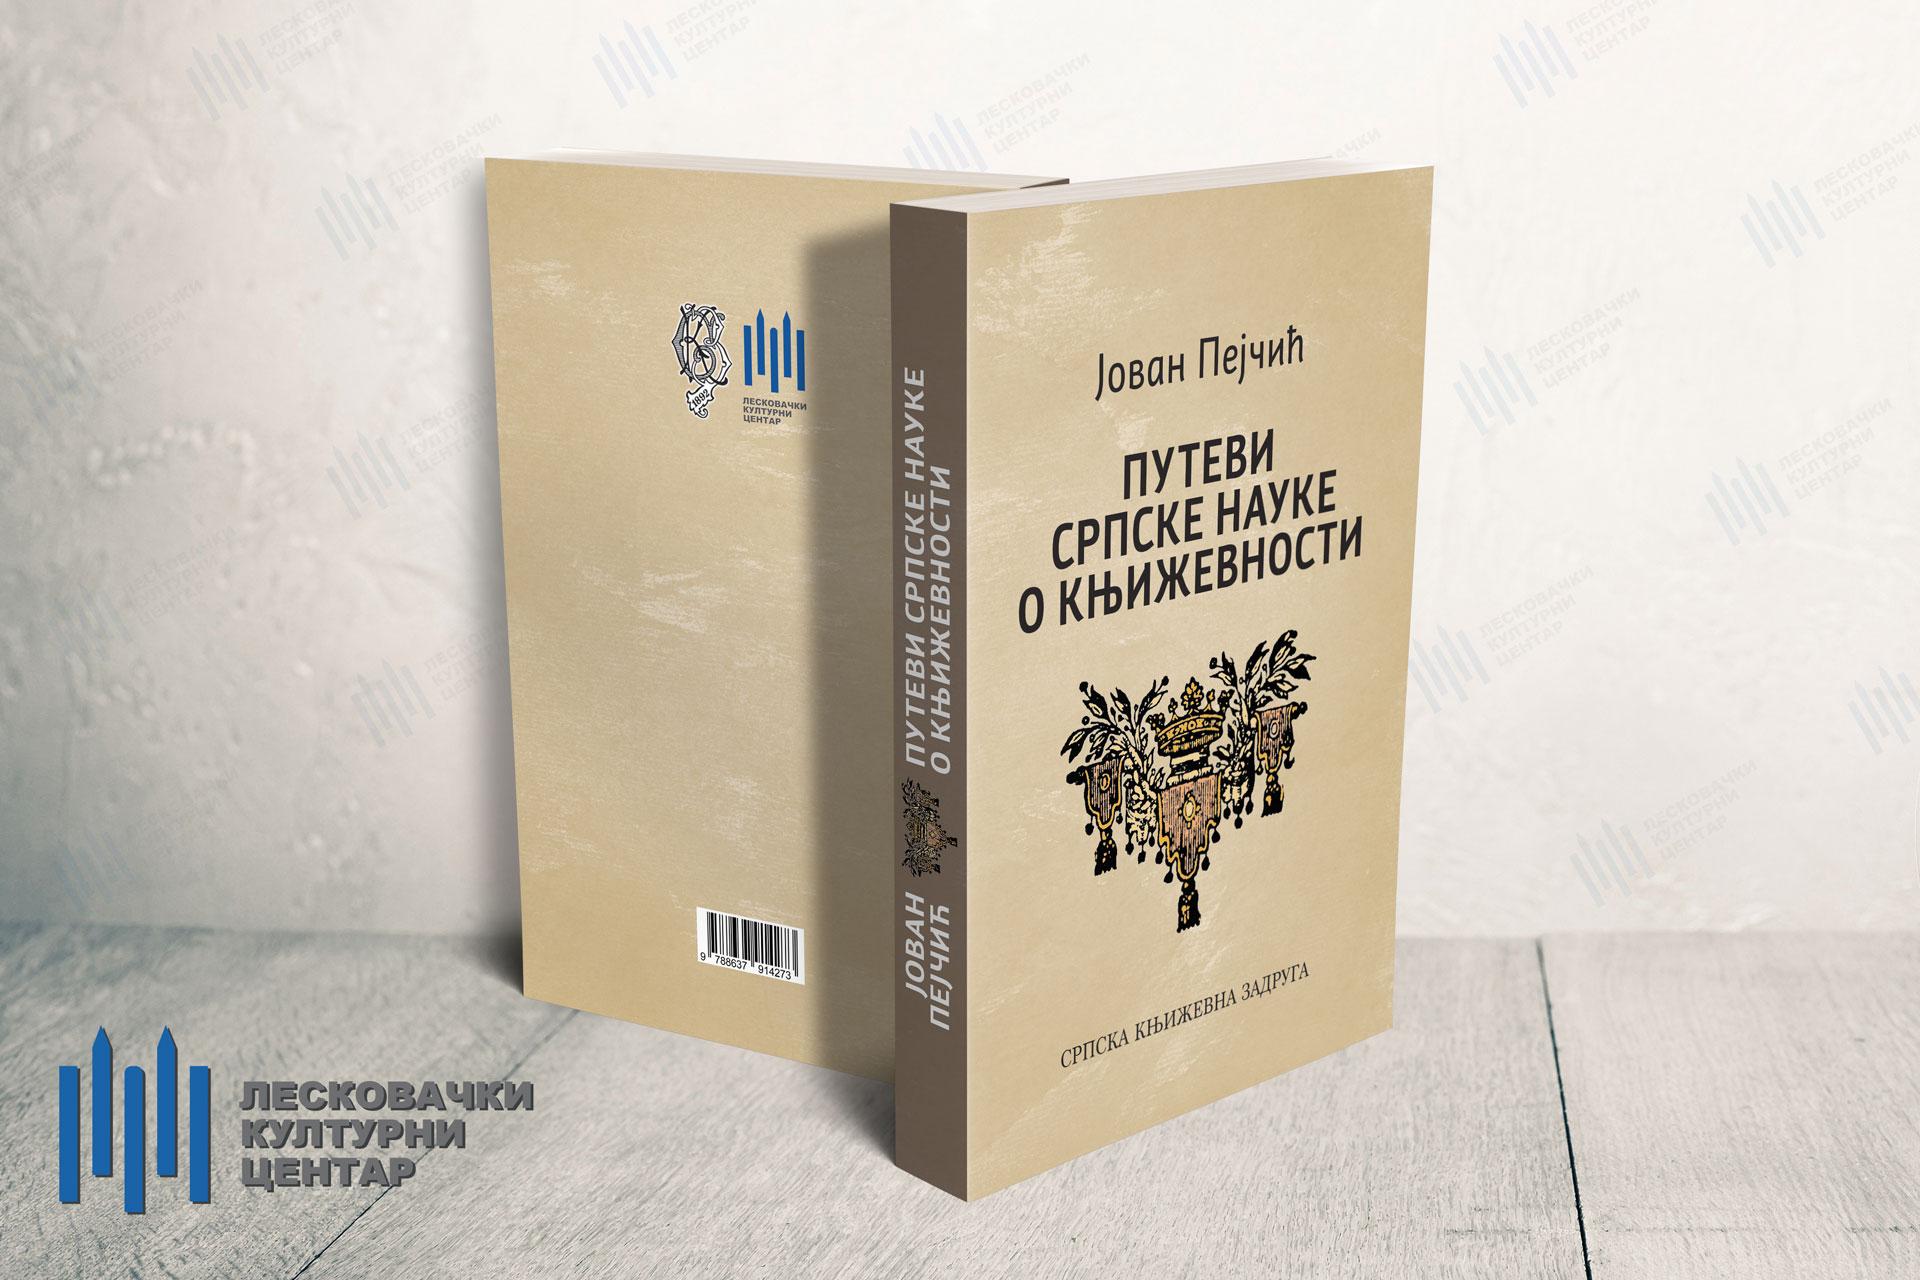 putevi-srpske-knjizevnosti-knjige